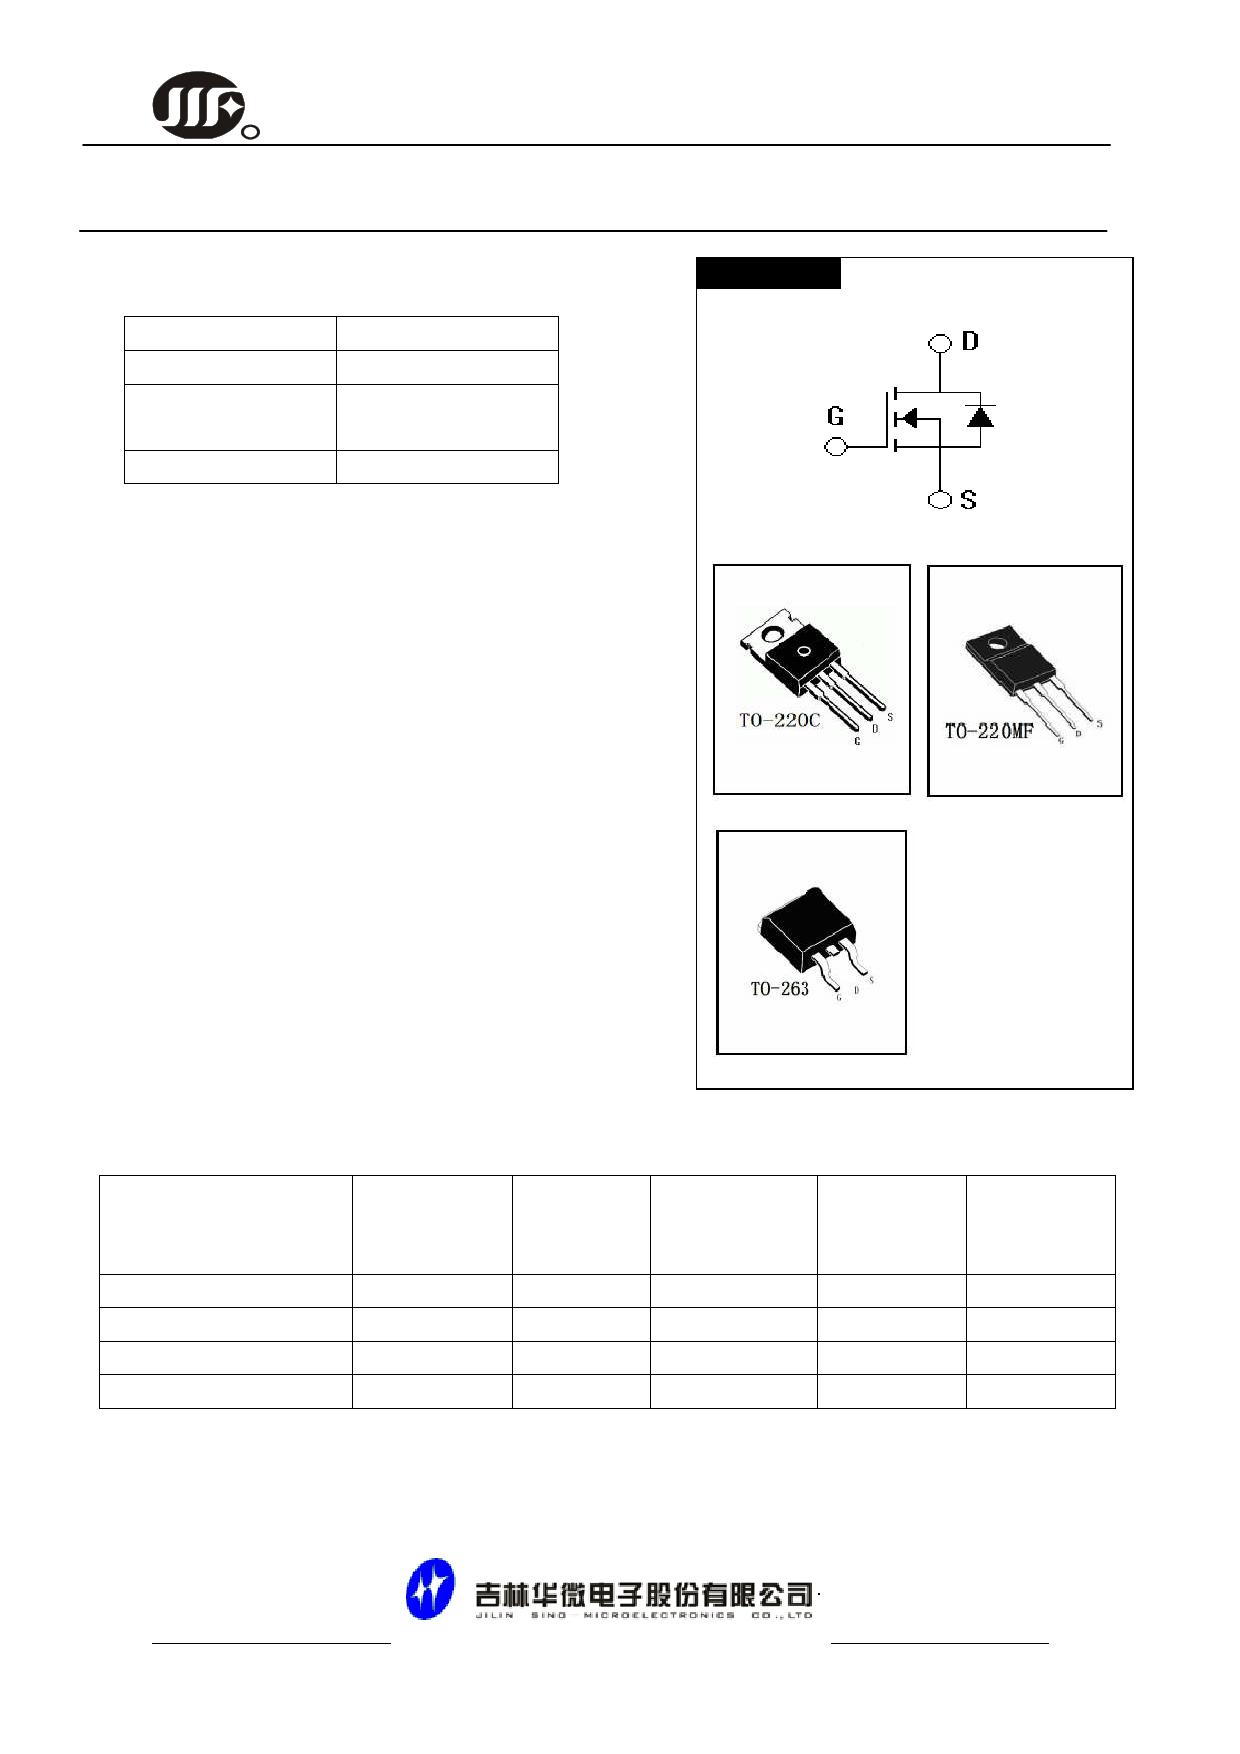 JCS75N75CF datasheet